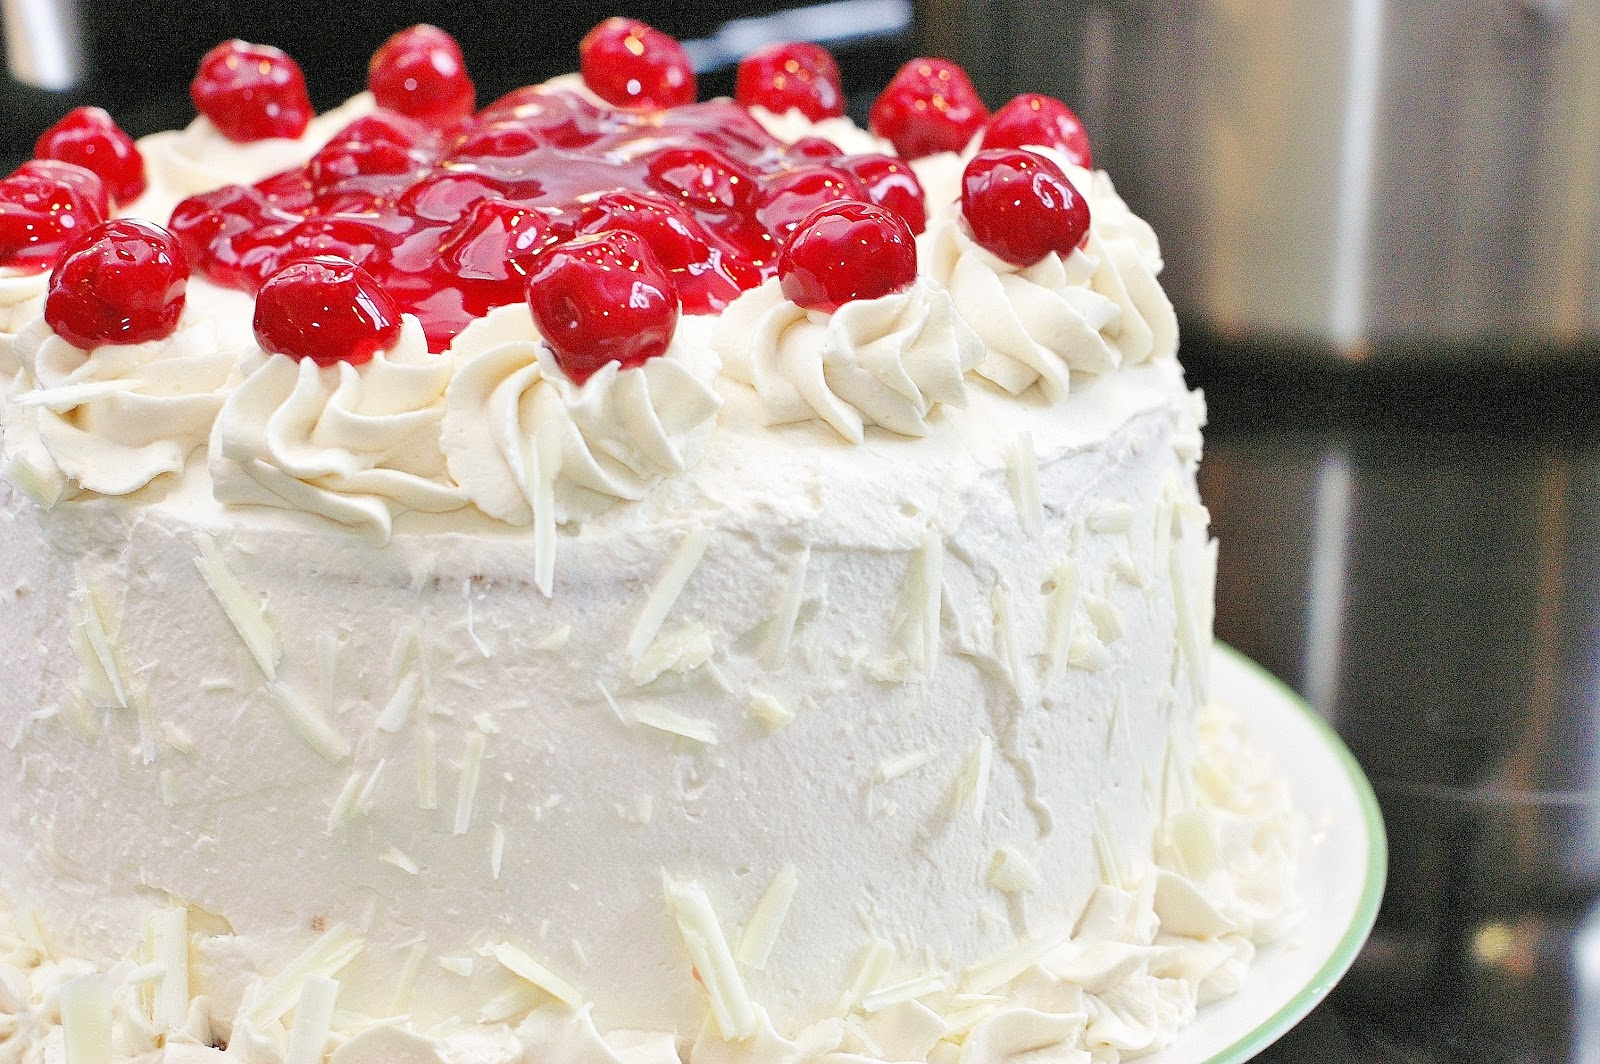 White forest cake وايت فوريست كيك